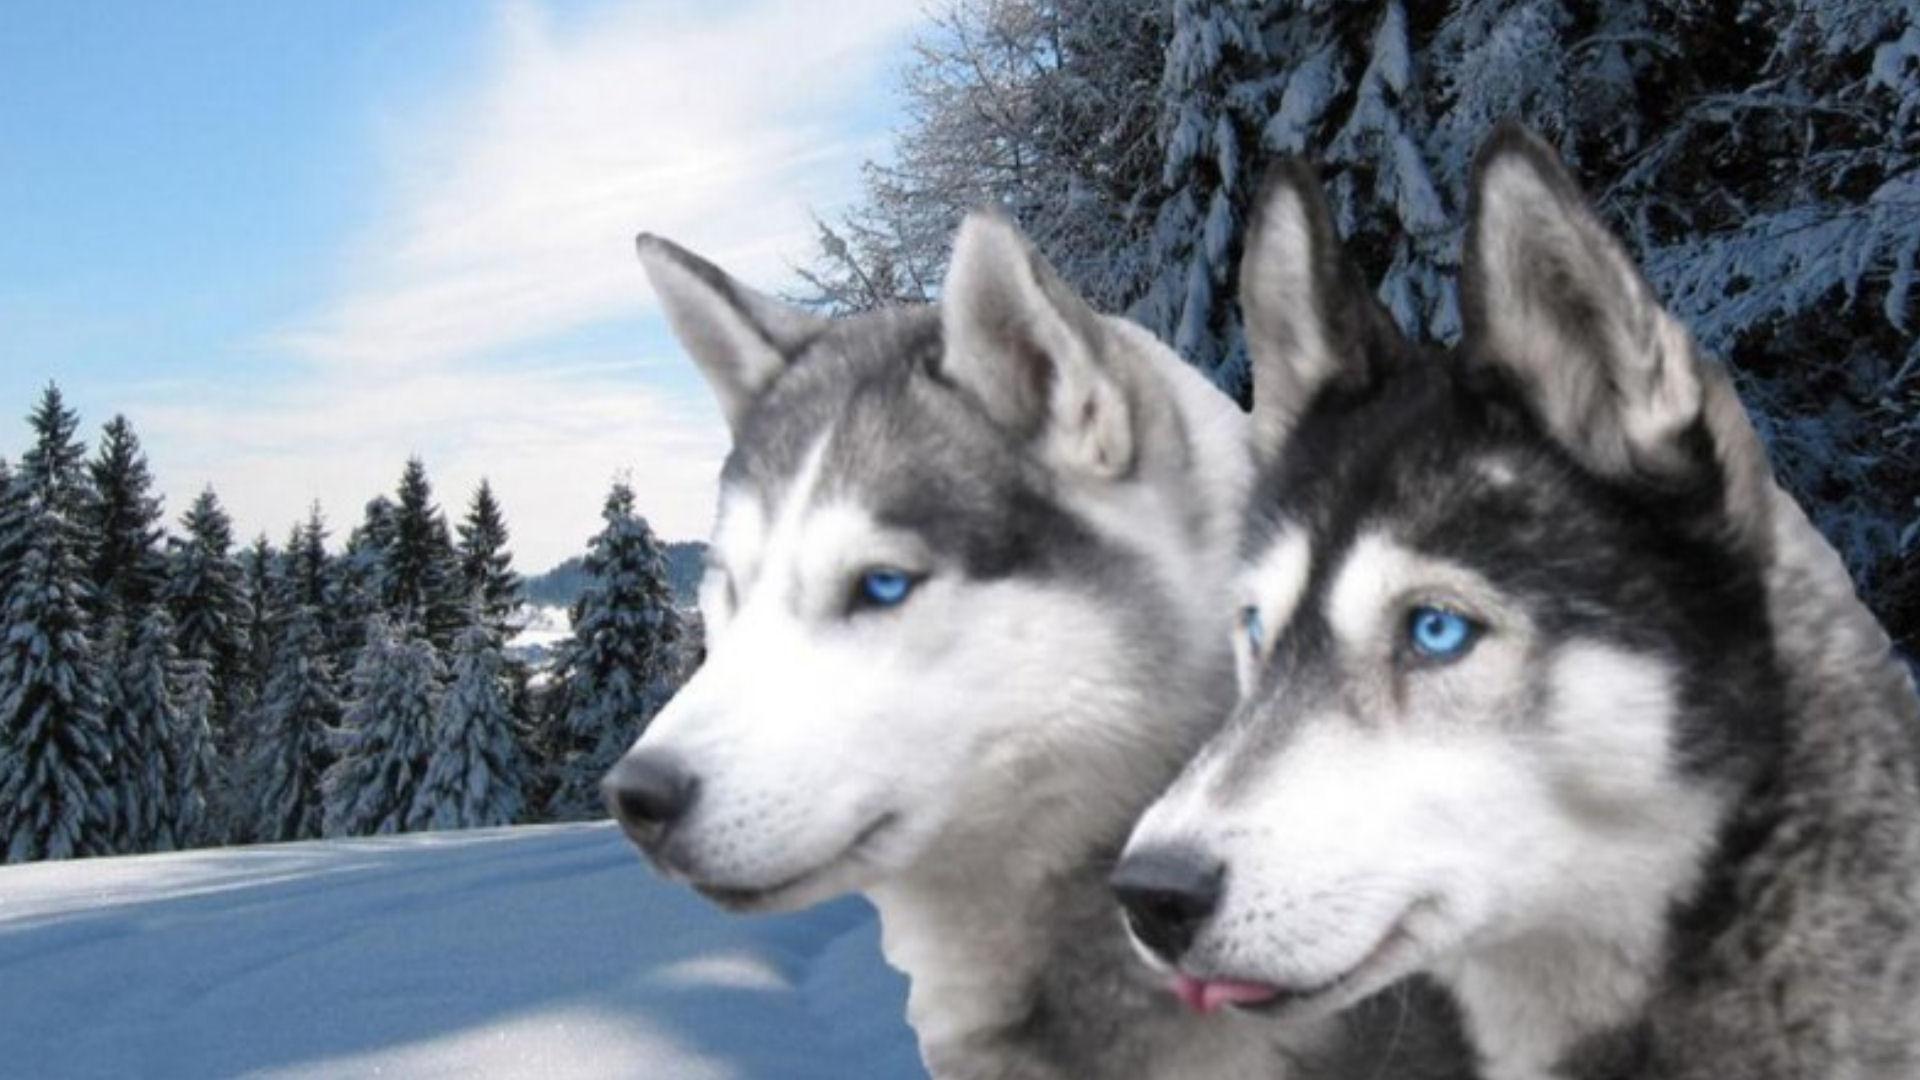 beautiful siberian huskies wallpaper #59439 - resolution 1920x1080